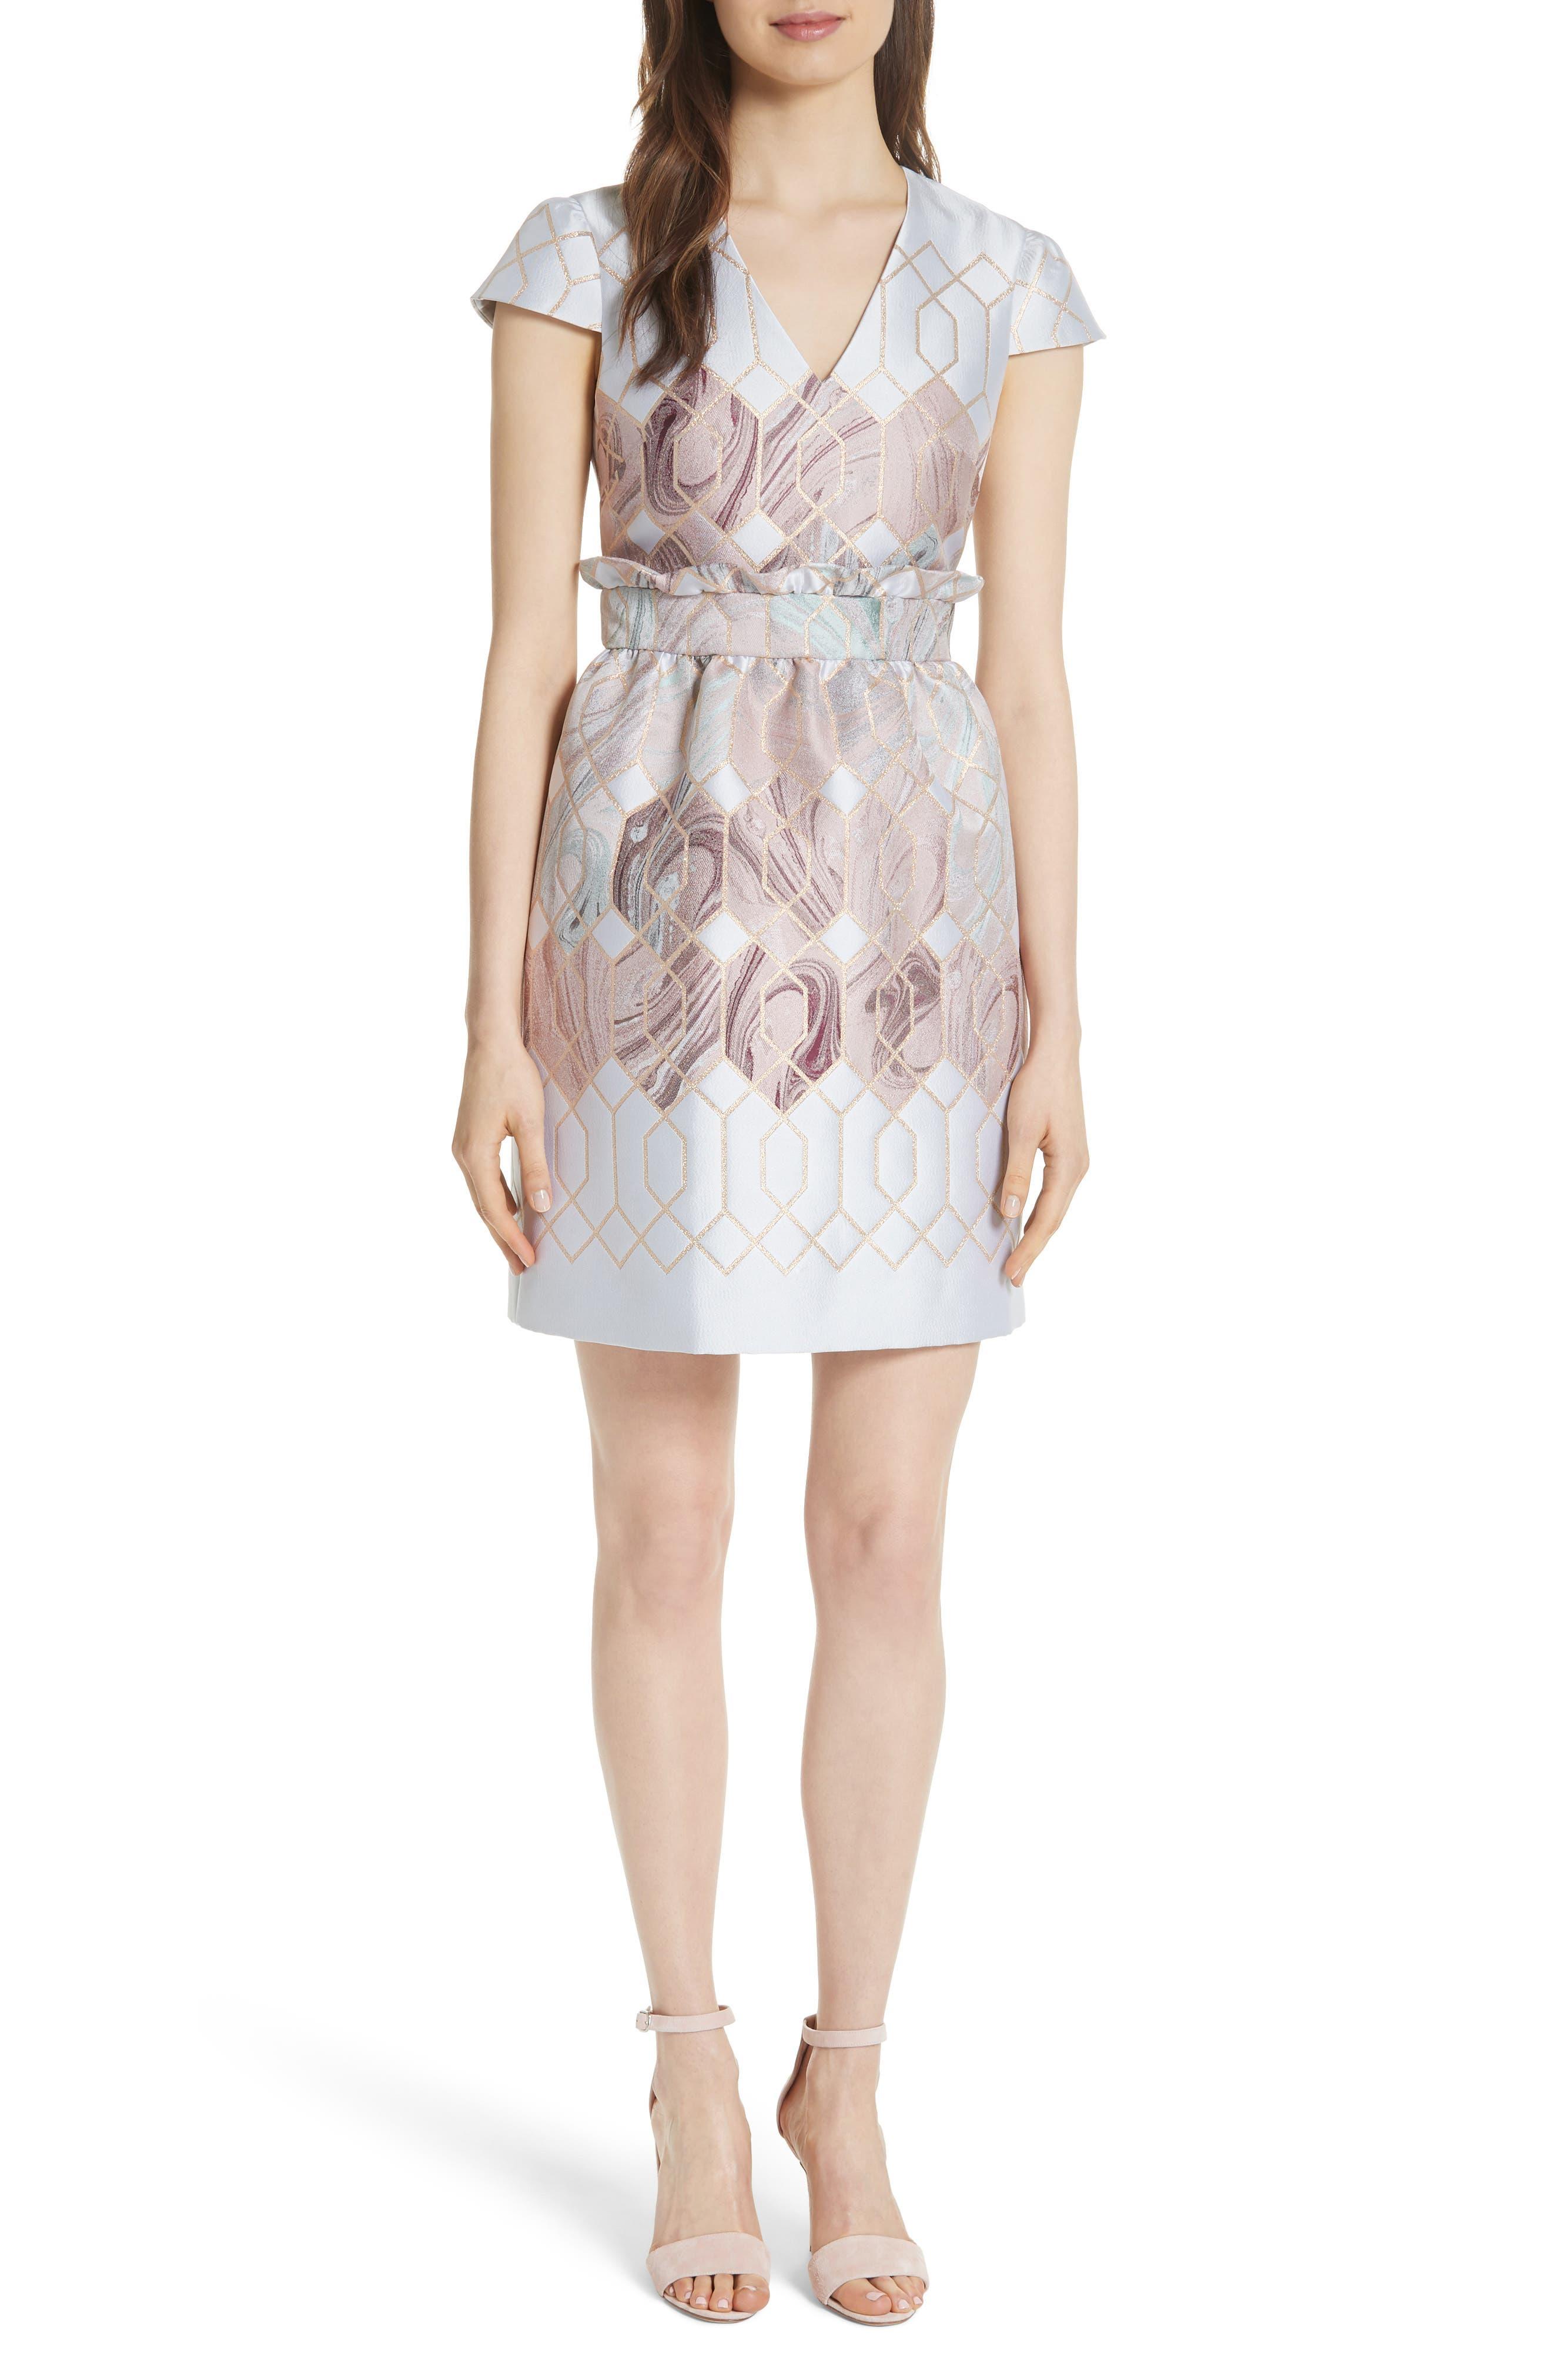 Ingrida Sea of Clouds Tulip Dress,                         Main,                         color, 110